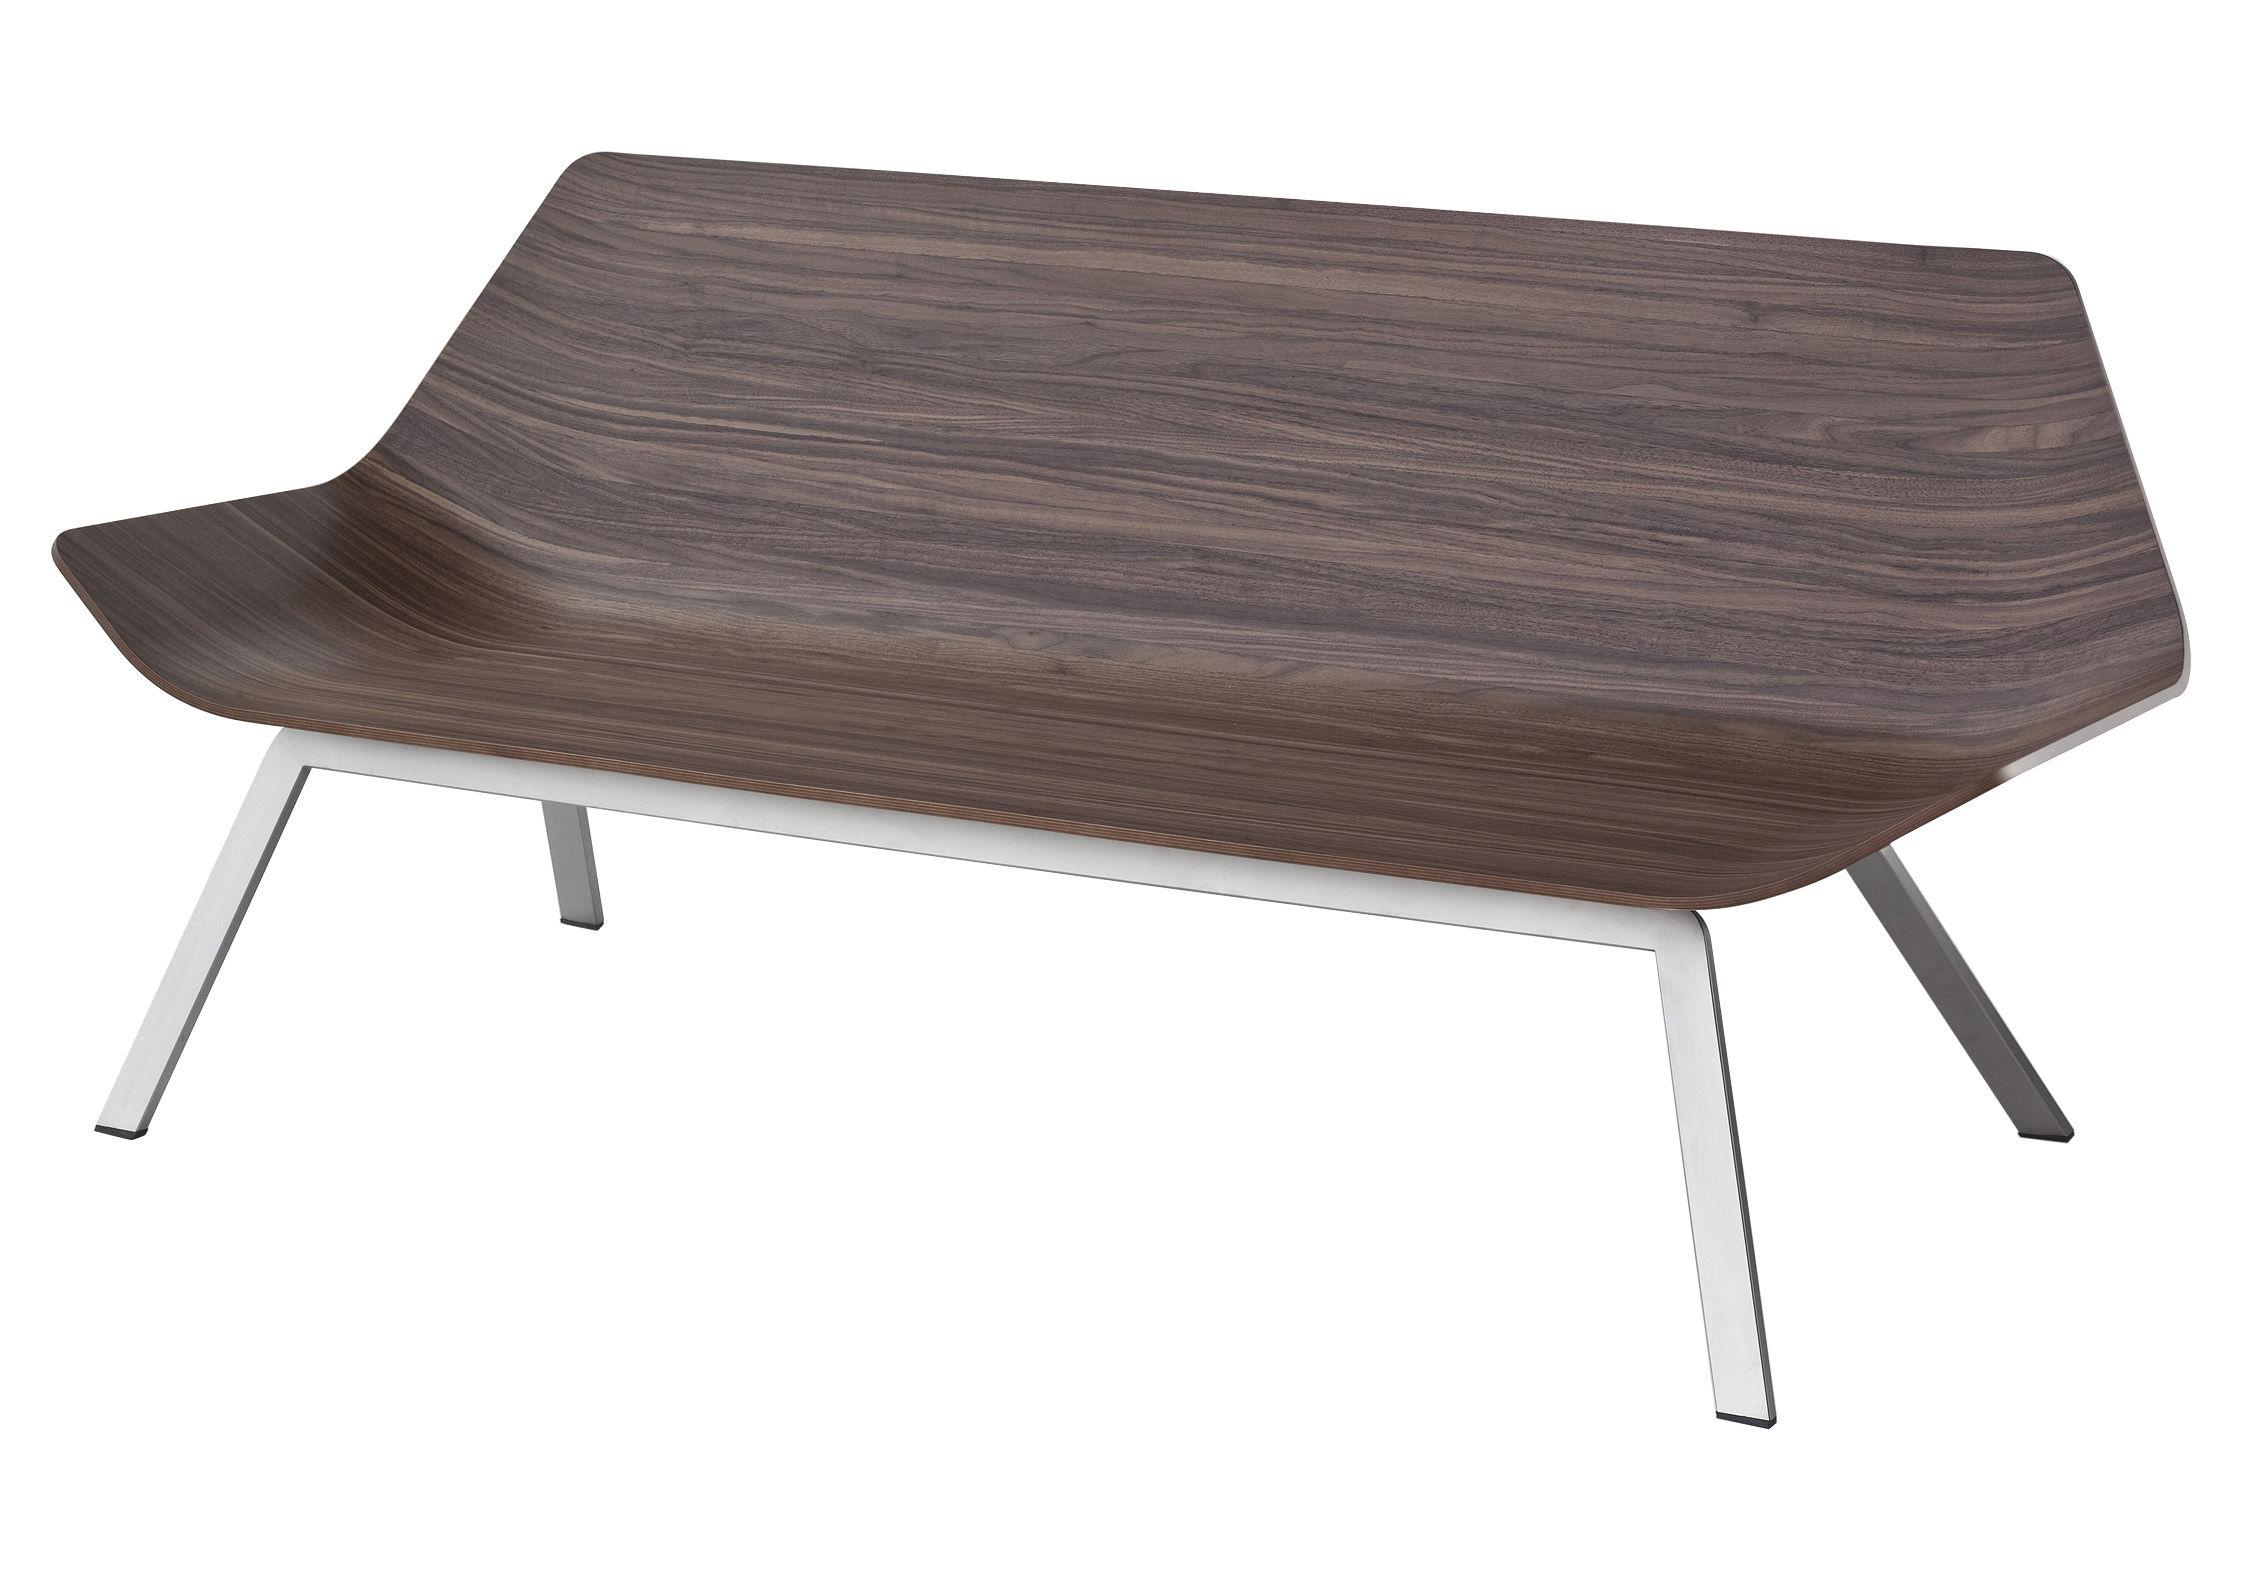 Furniture - Benches - Otium Bench by Lapalma - Walnut - Sandy stainless steel, Walnut